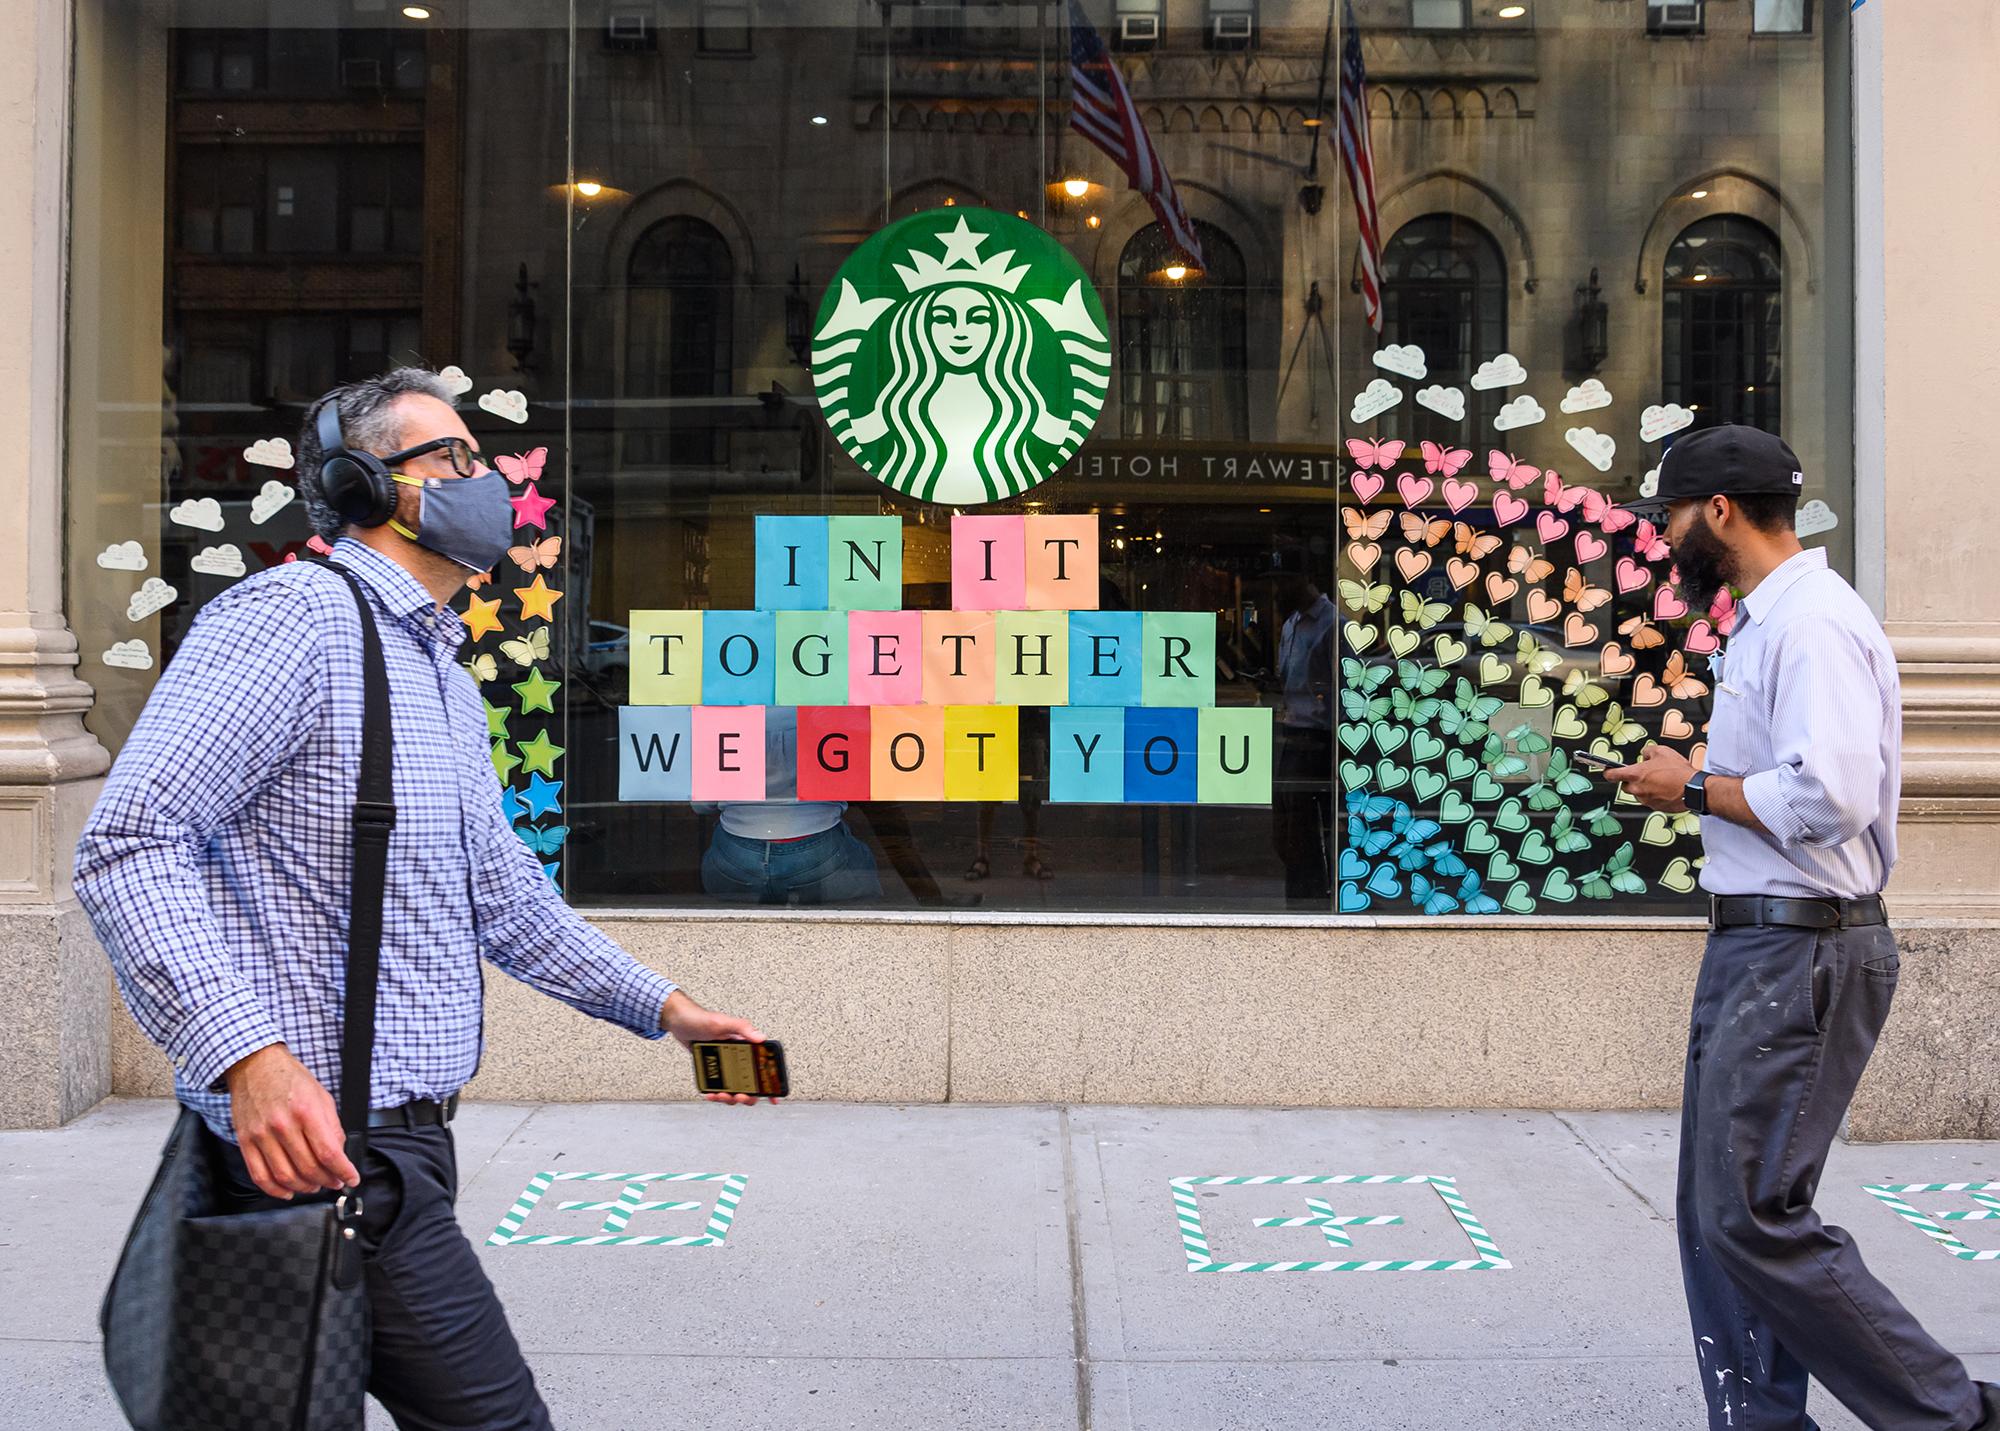 Starbucks Sales 2020 After Christmas Coronavirus continues to weigh heavy on Starbucks sales despite